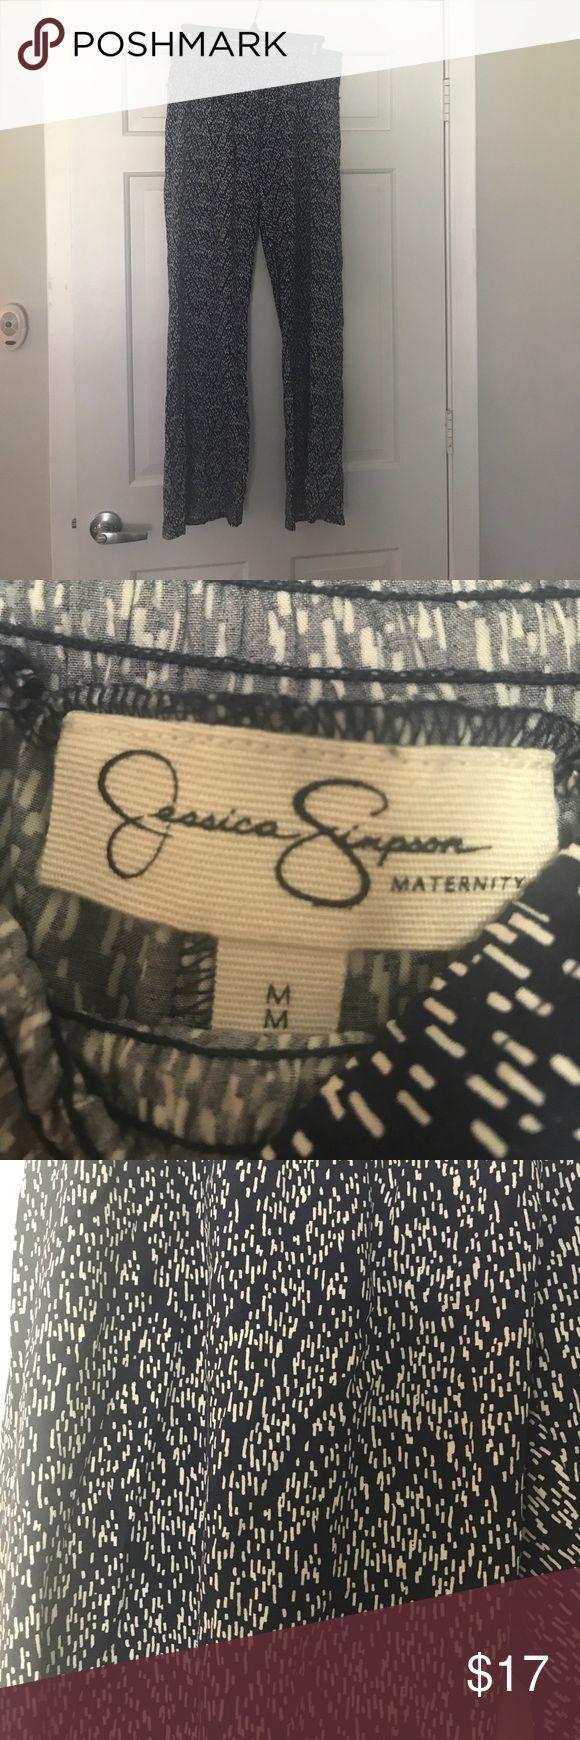 Jessica Simpson maternity pants. Size M. Jessica Simpson maternity pants. Size M. jessica simpson maternity Pants Wide Leg